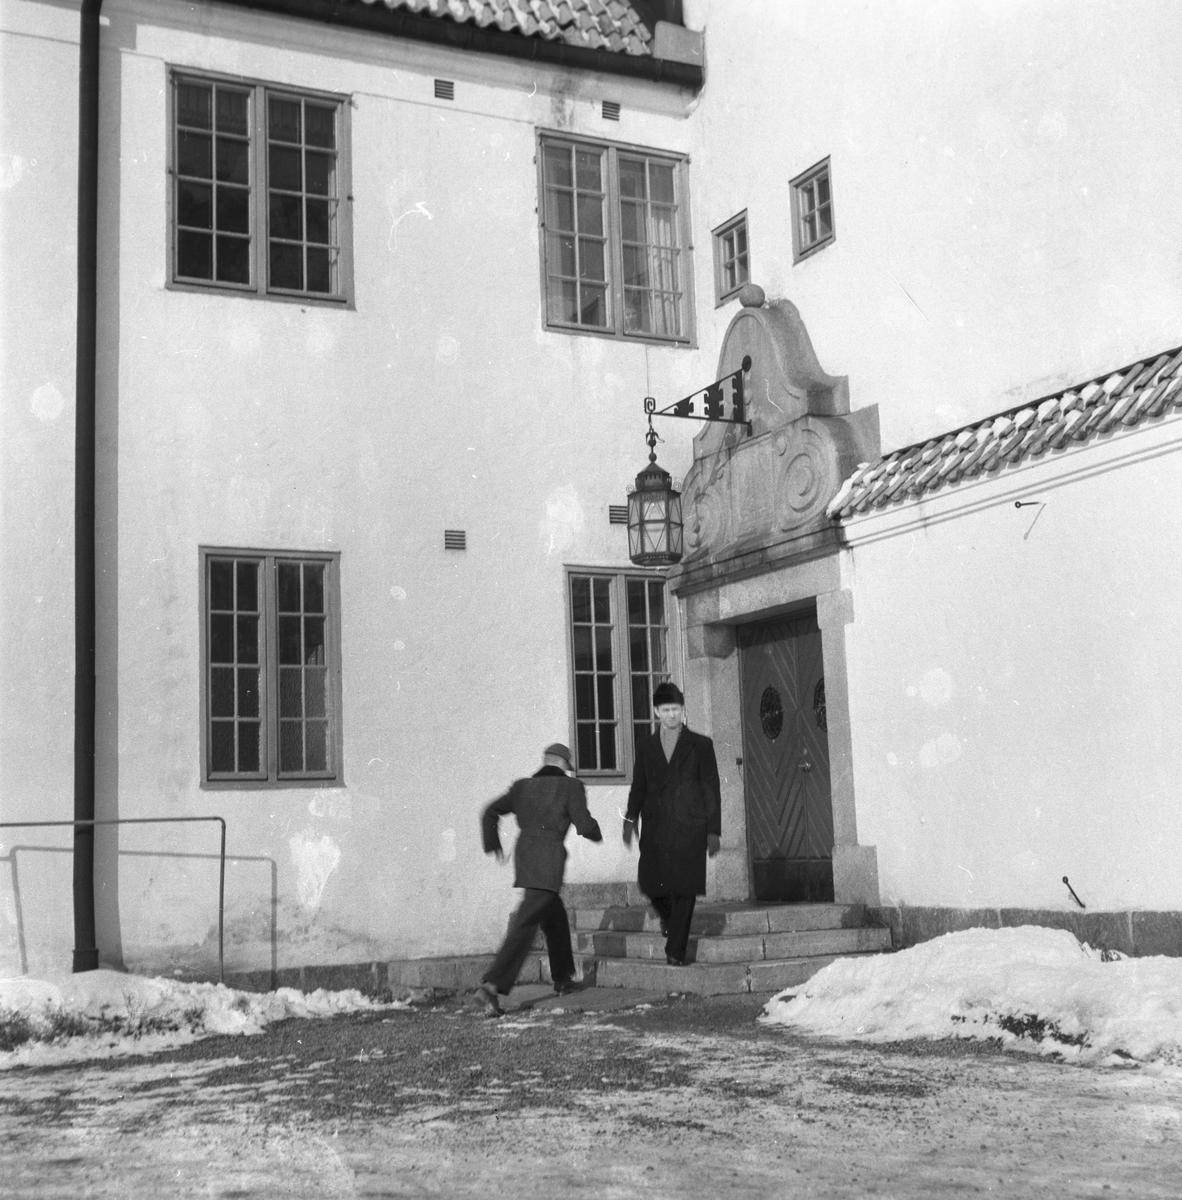 Huvudkontoret. Korsnäs AB. Den 9 mars 1955.